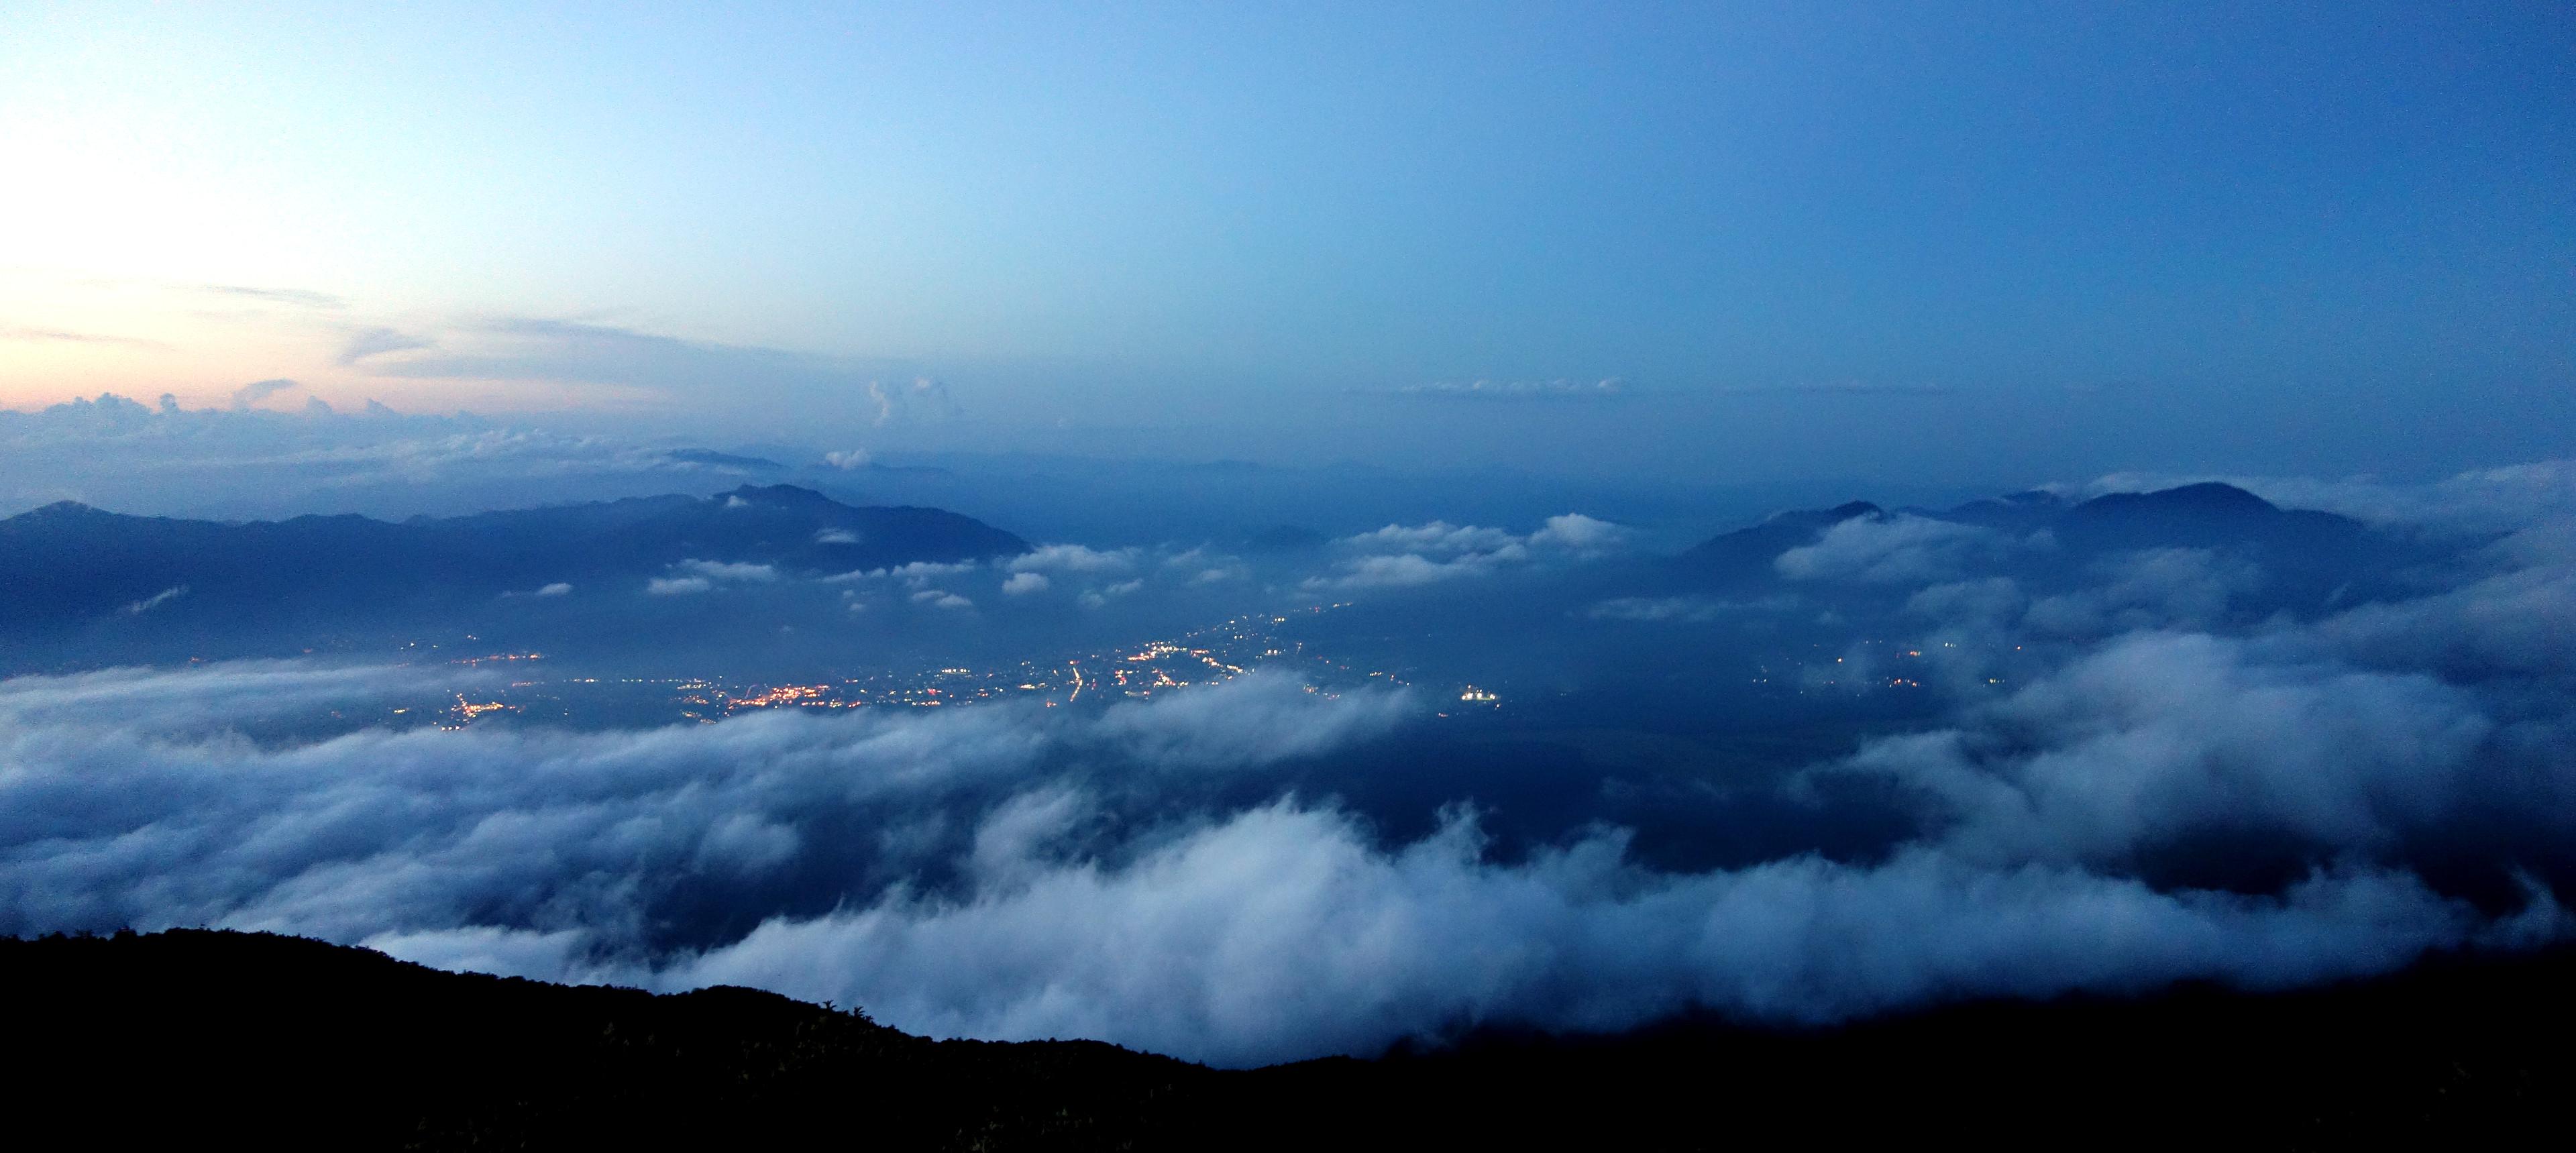 20140806 122408 fujisan evening view